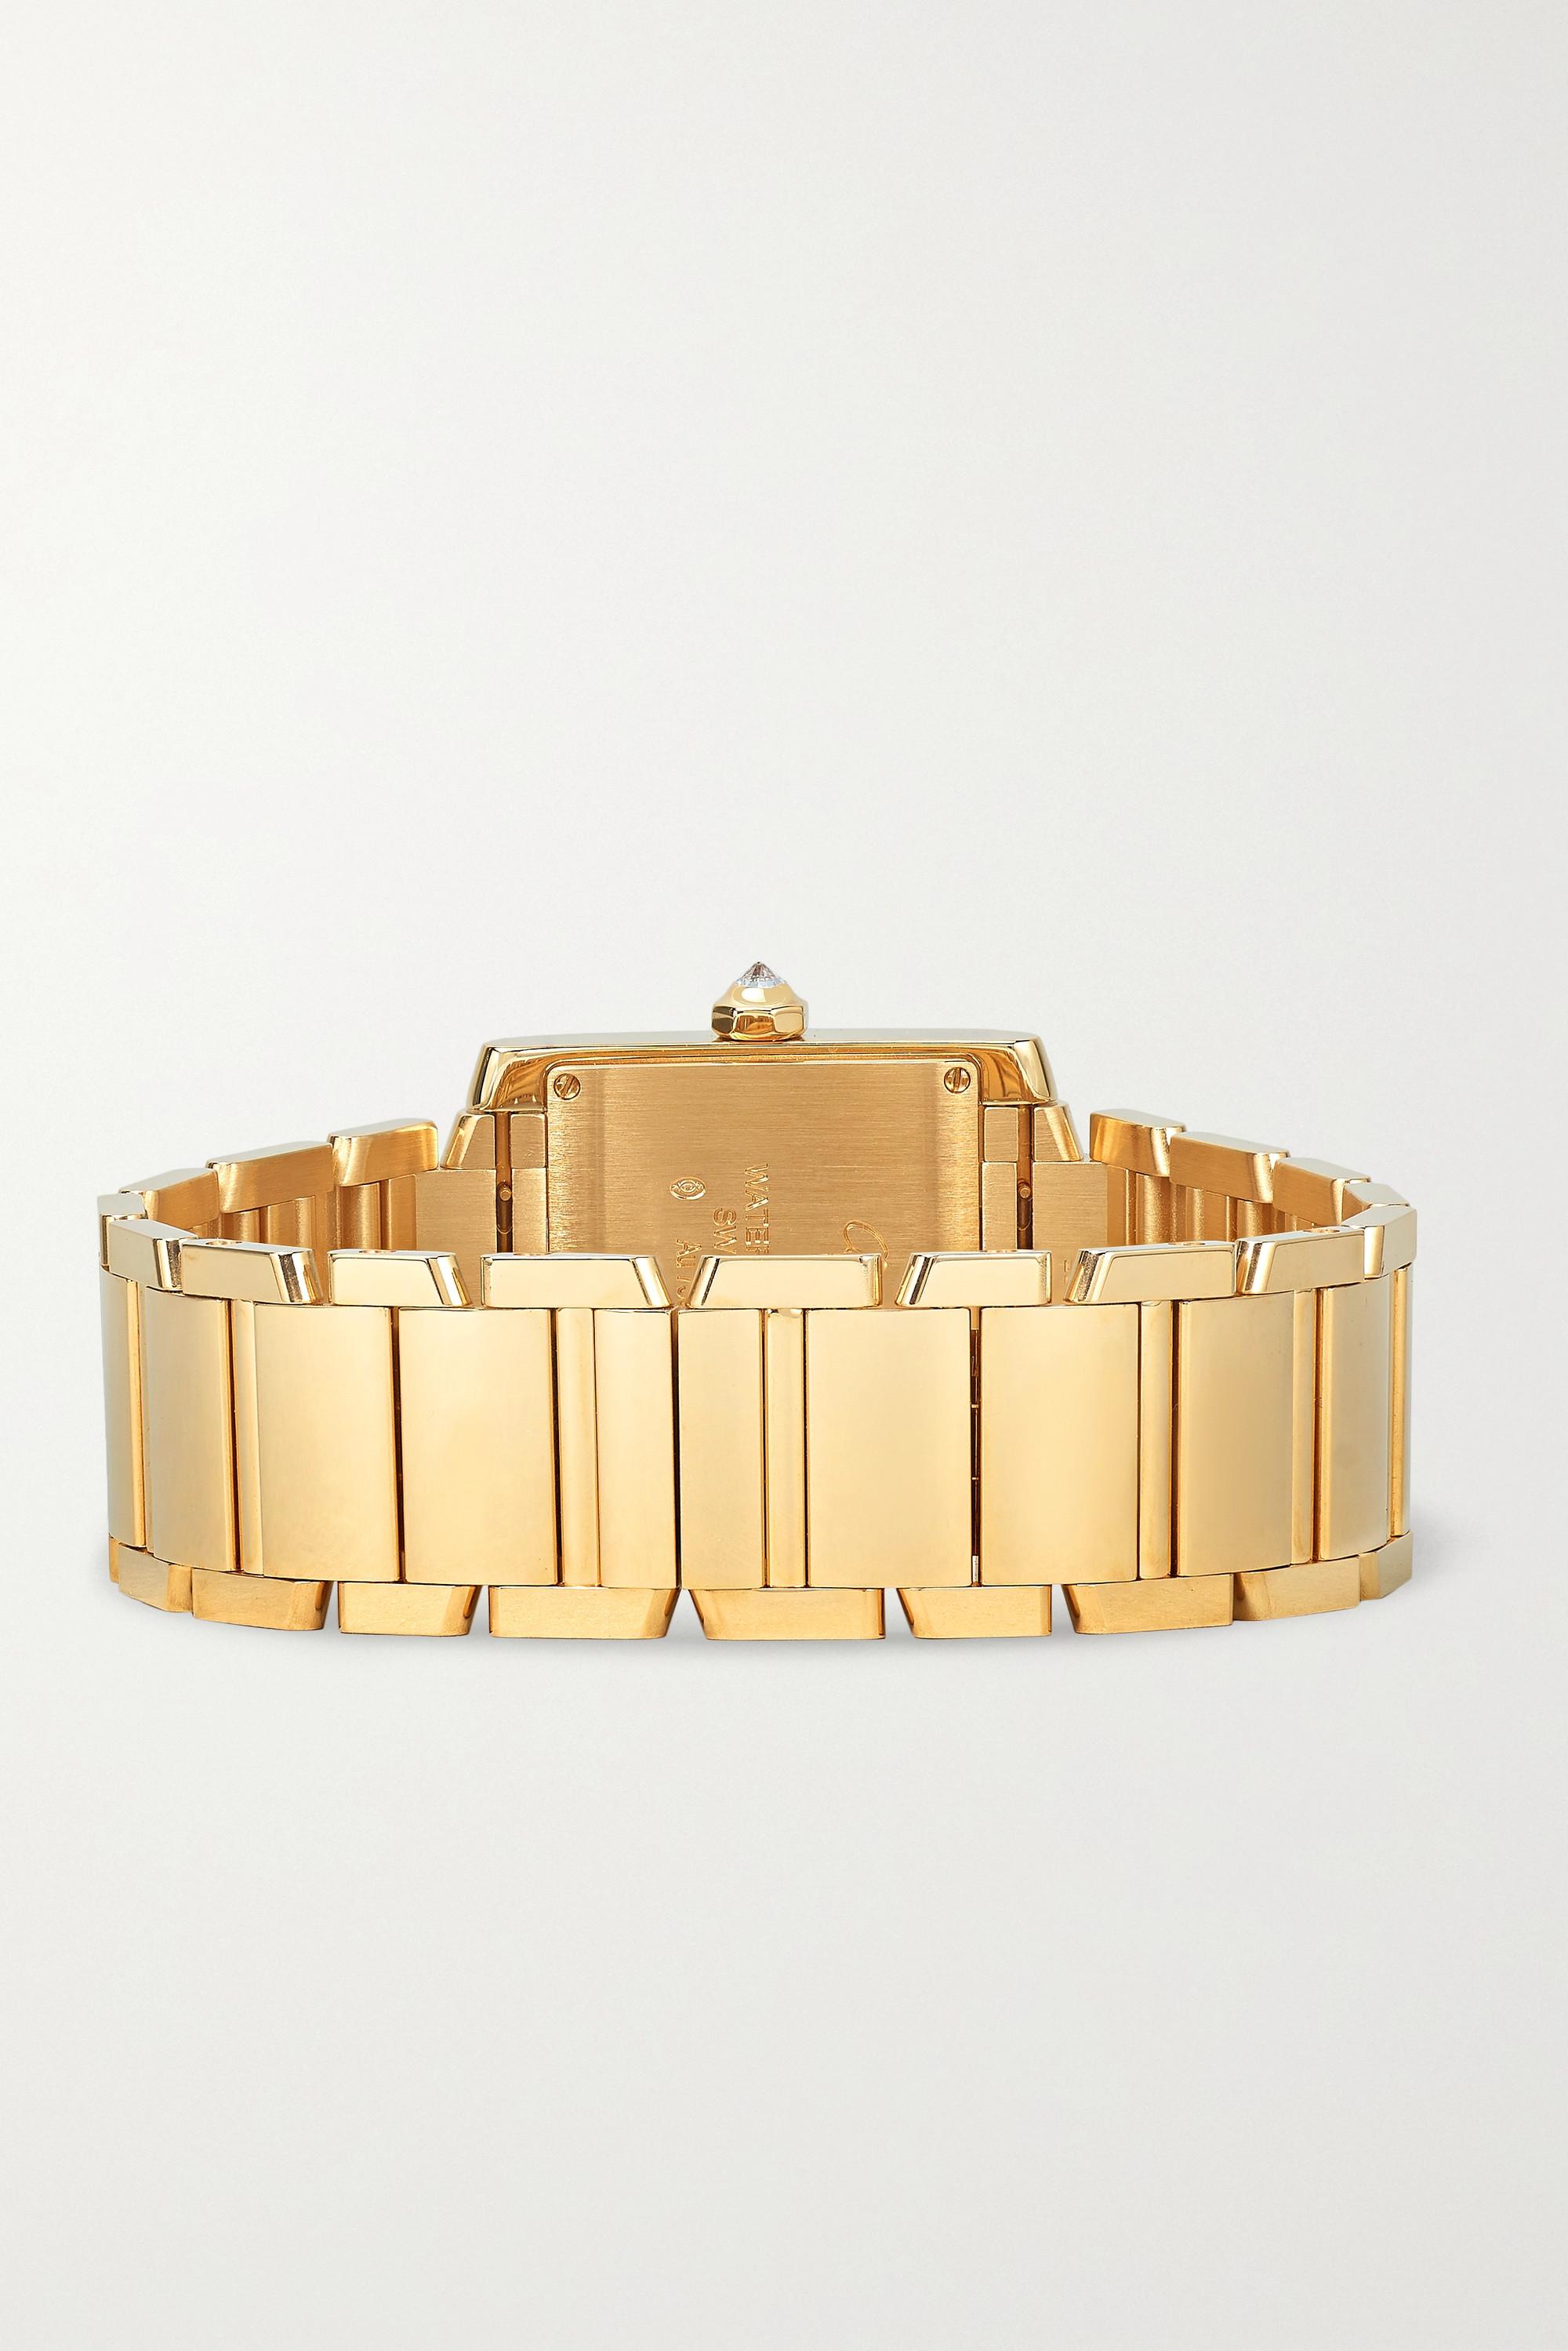 Cartier Tank Française 25 毫米 18K 黄金钻石中号腕表